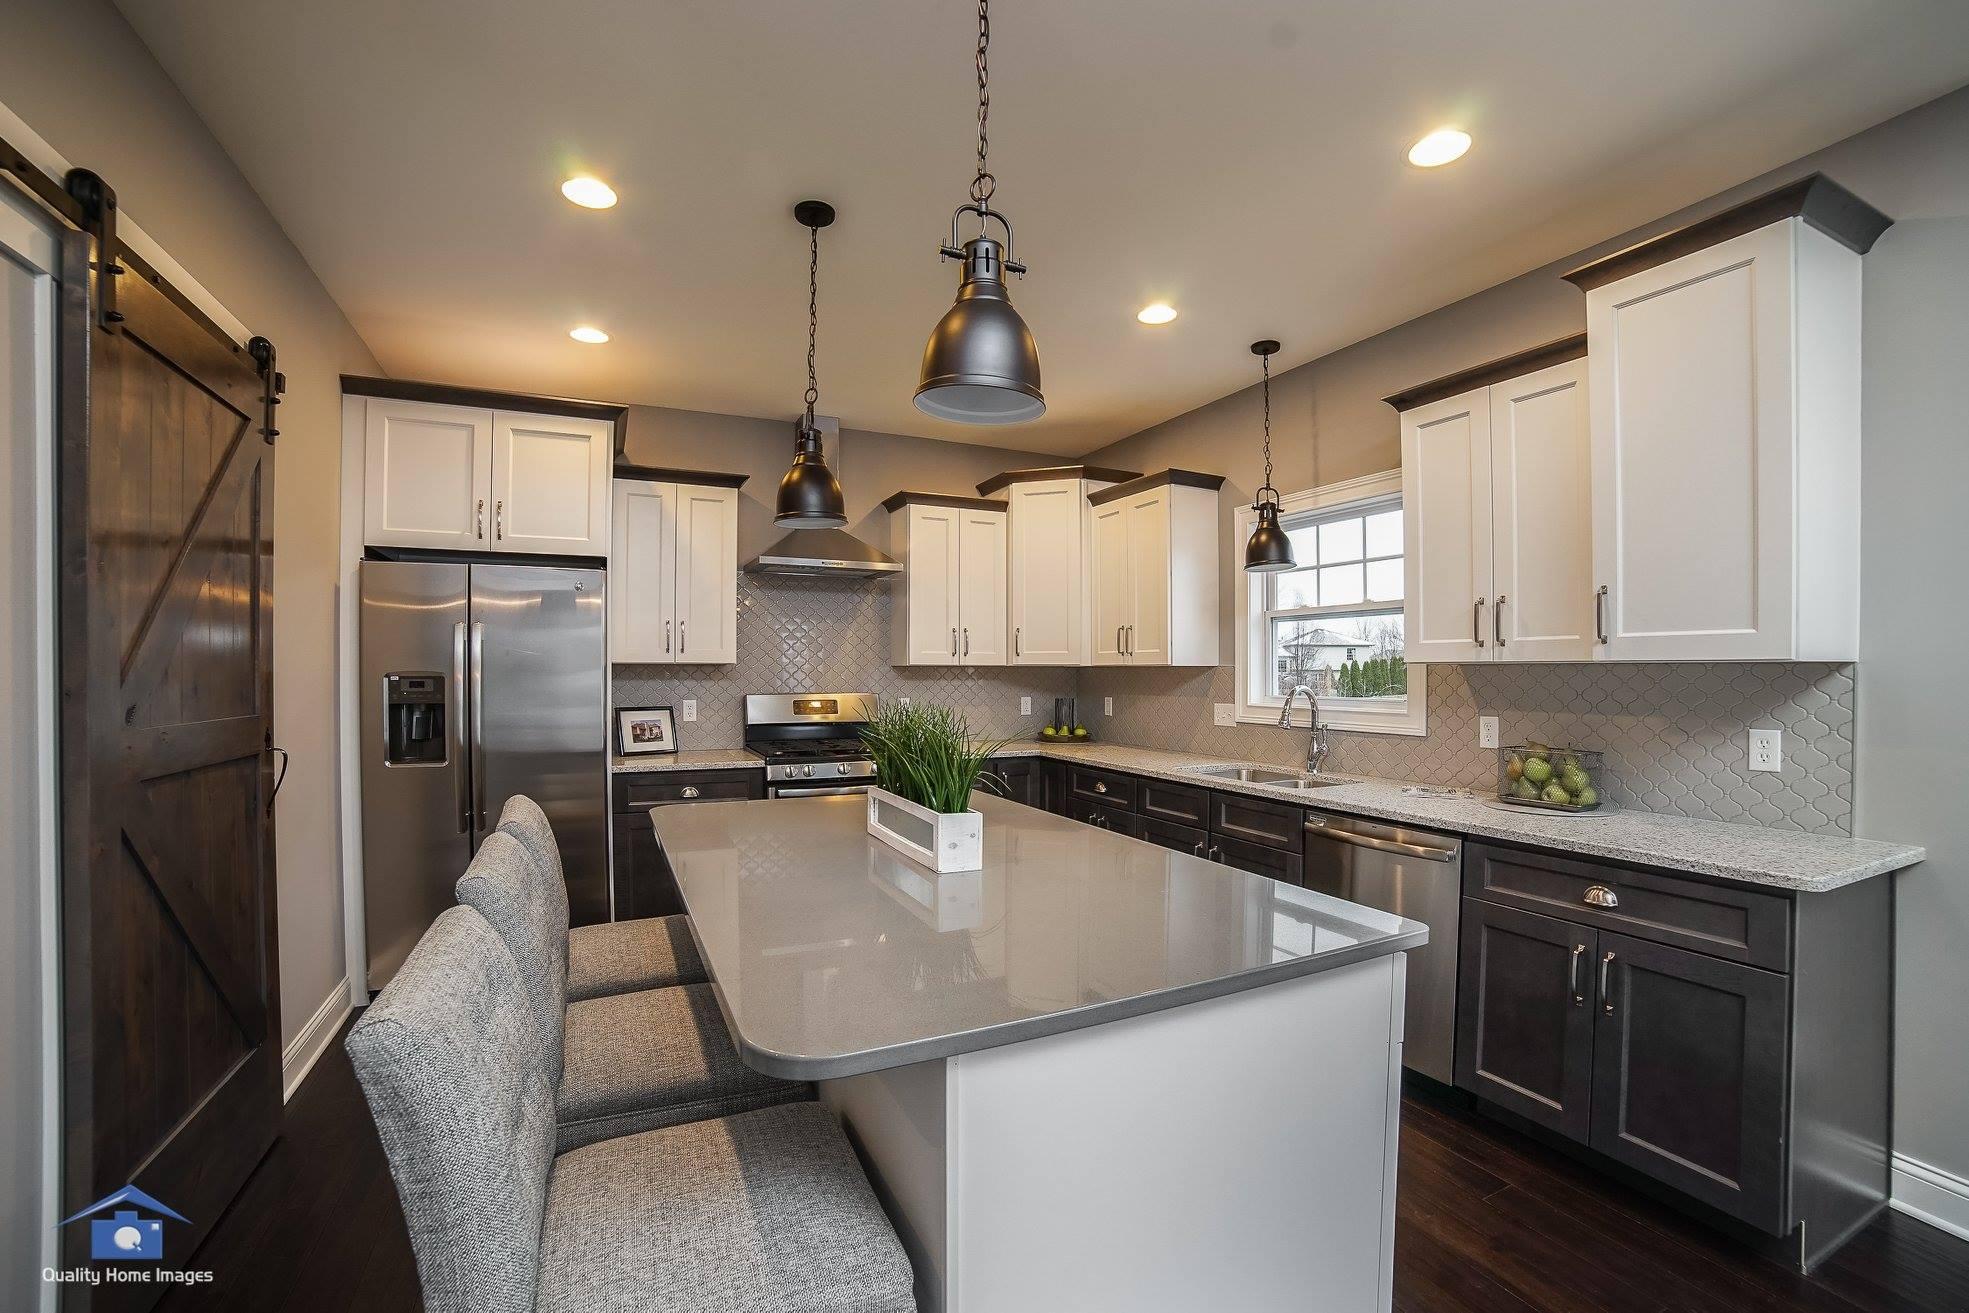 dabrowski nwi chicagoland custom kitchen designer